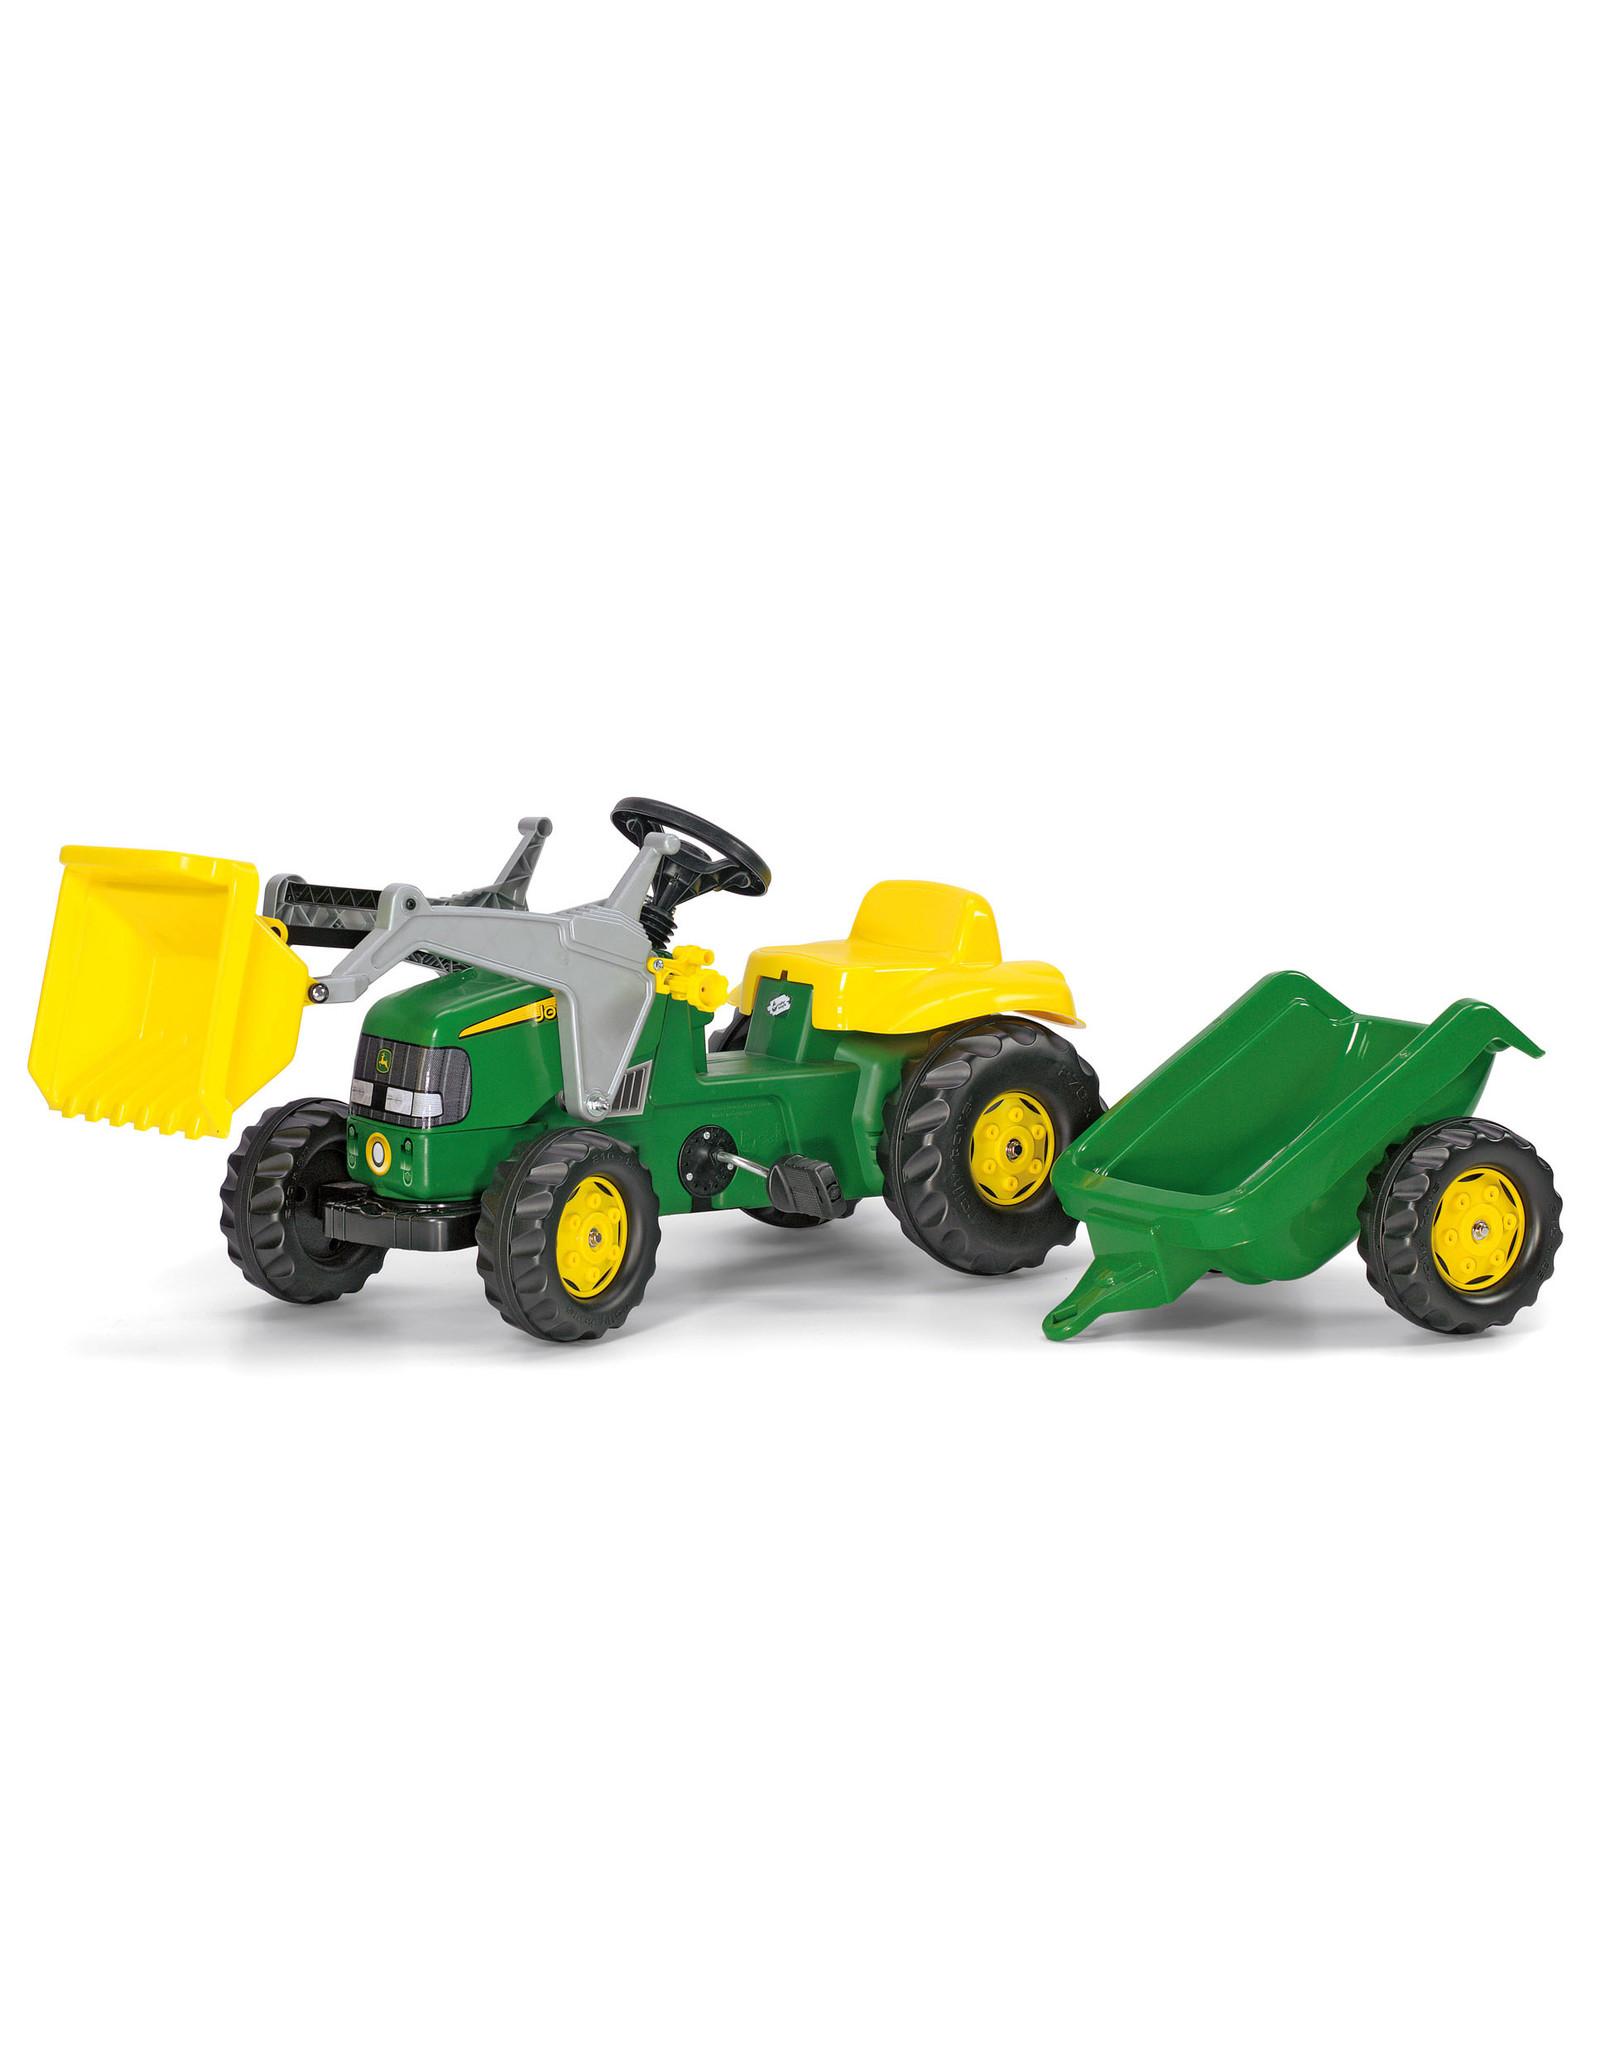 Kettler Kettler John Deere Kid Tractor with Trailer